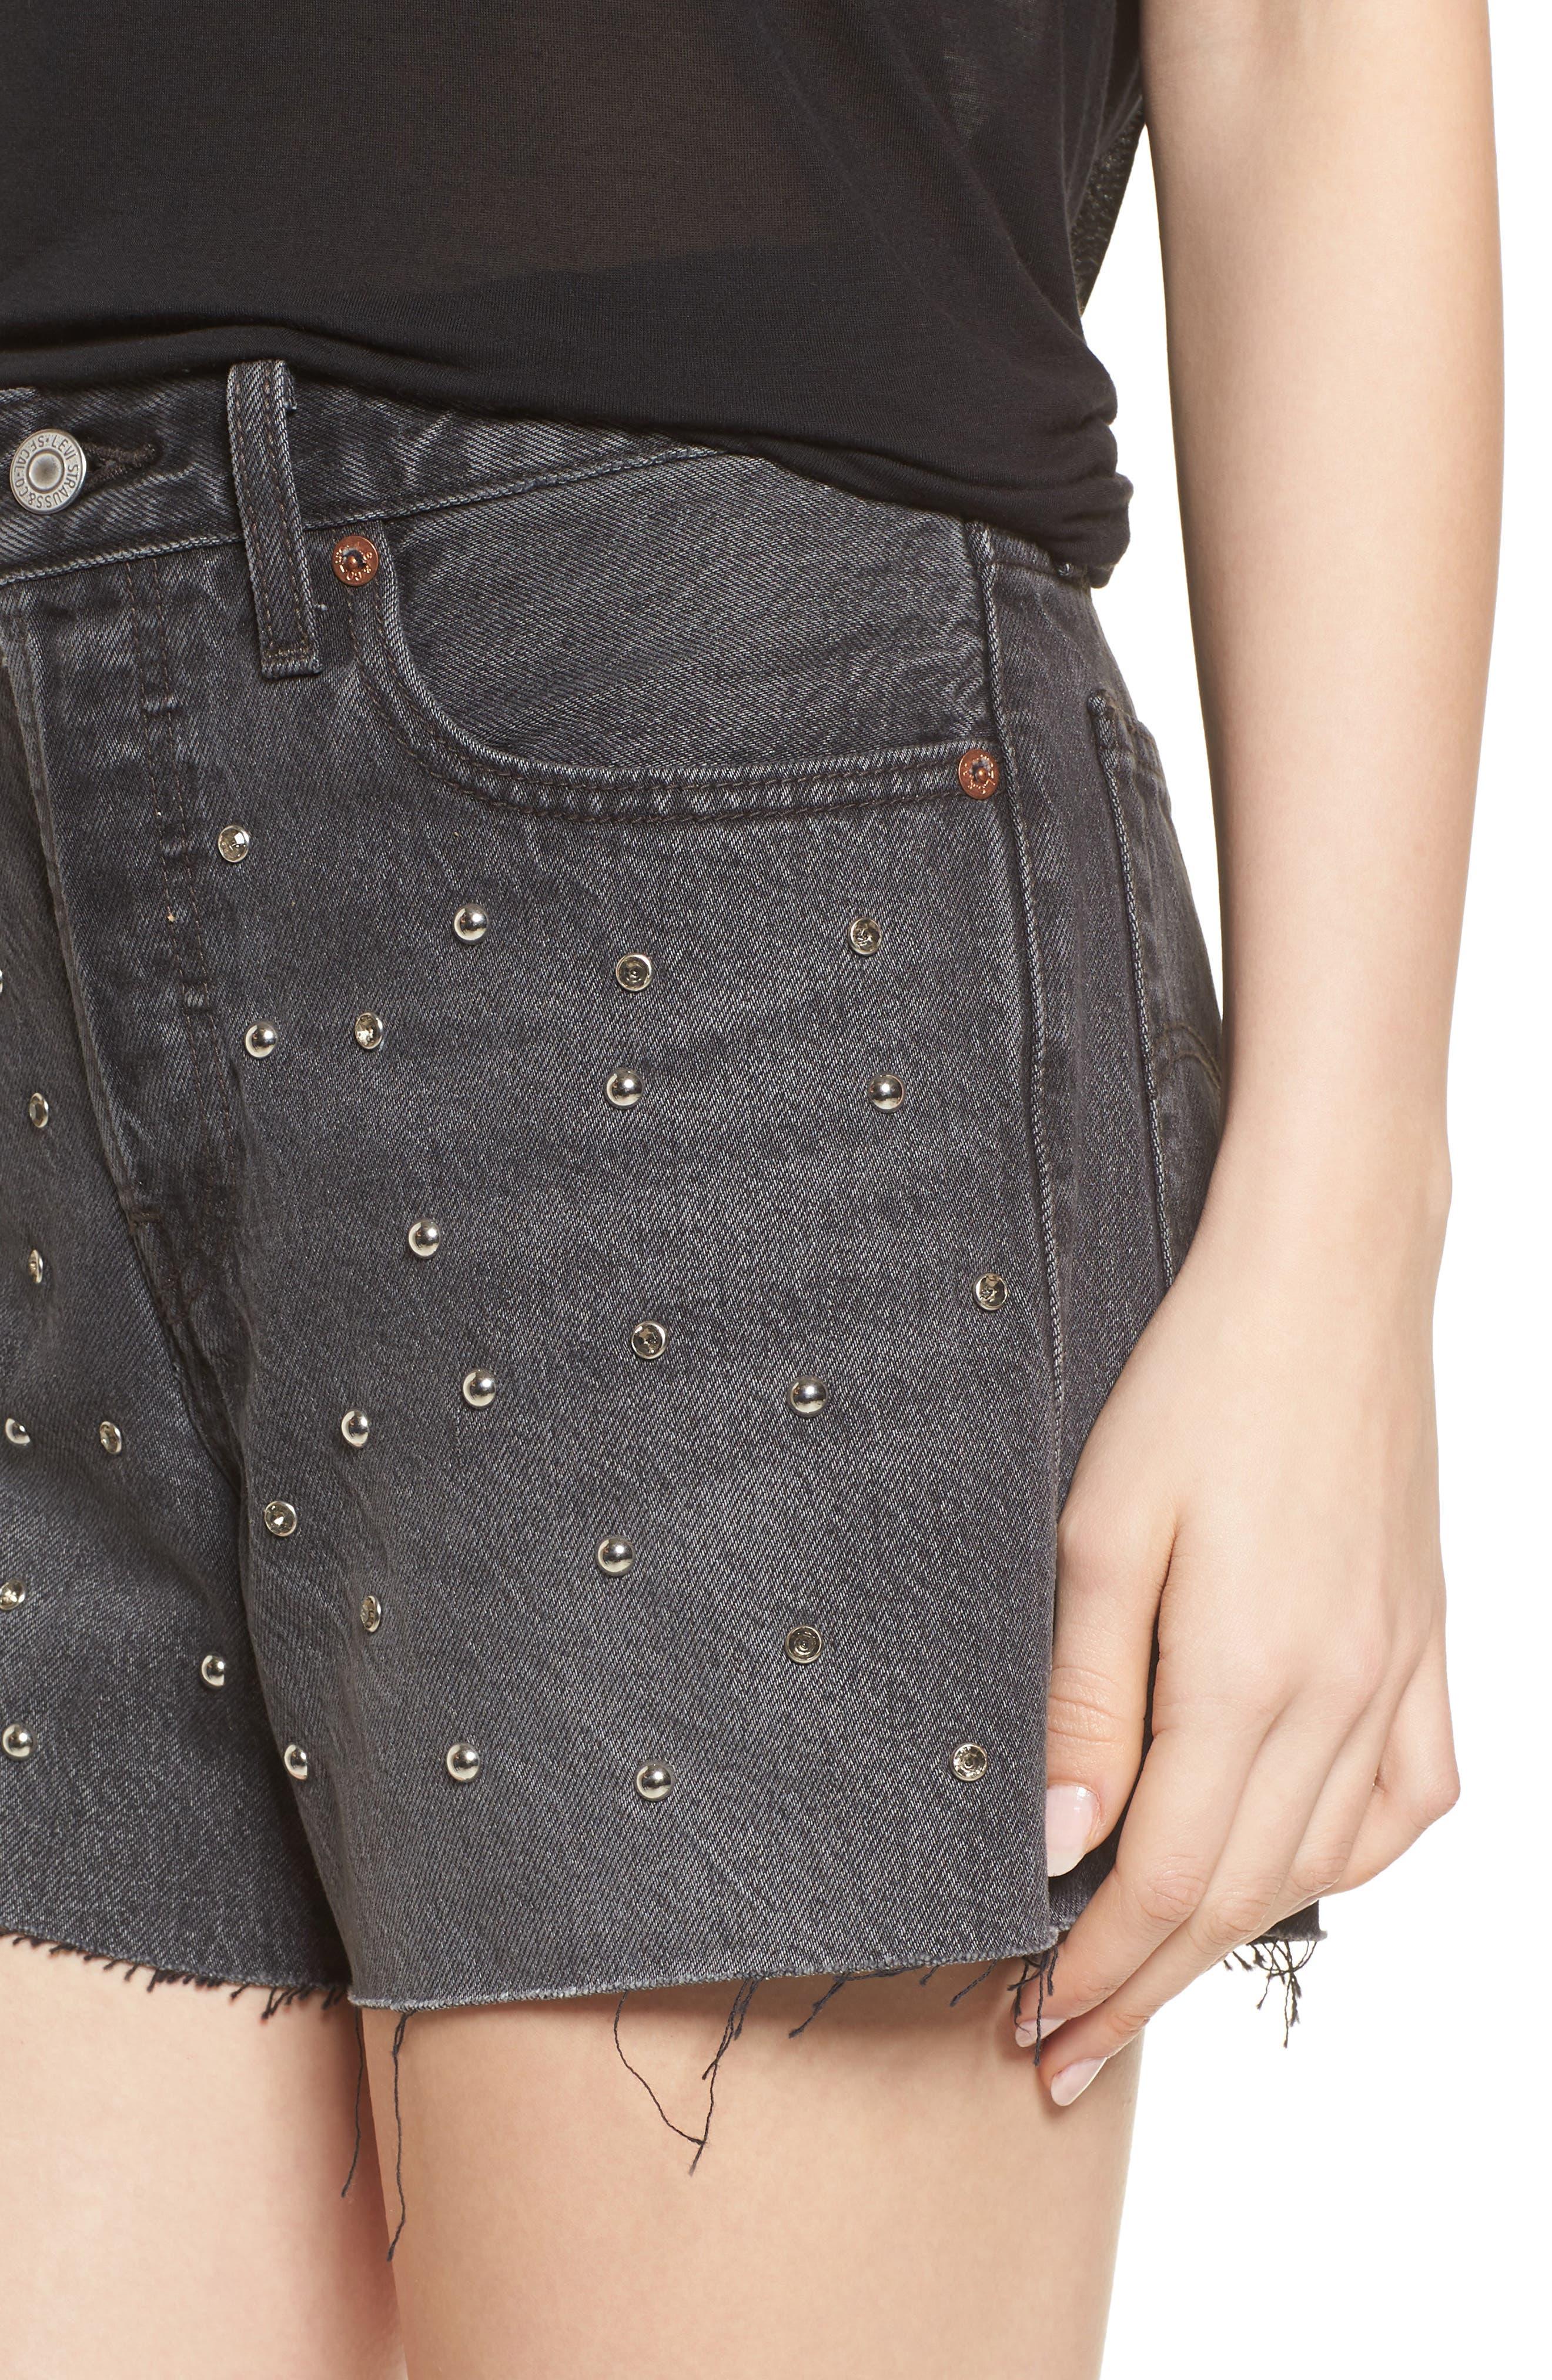 Wedgie High Waist Cutoff Denim Shorts,                             Alternate thumbnail 4, color,                             Bling Bling